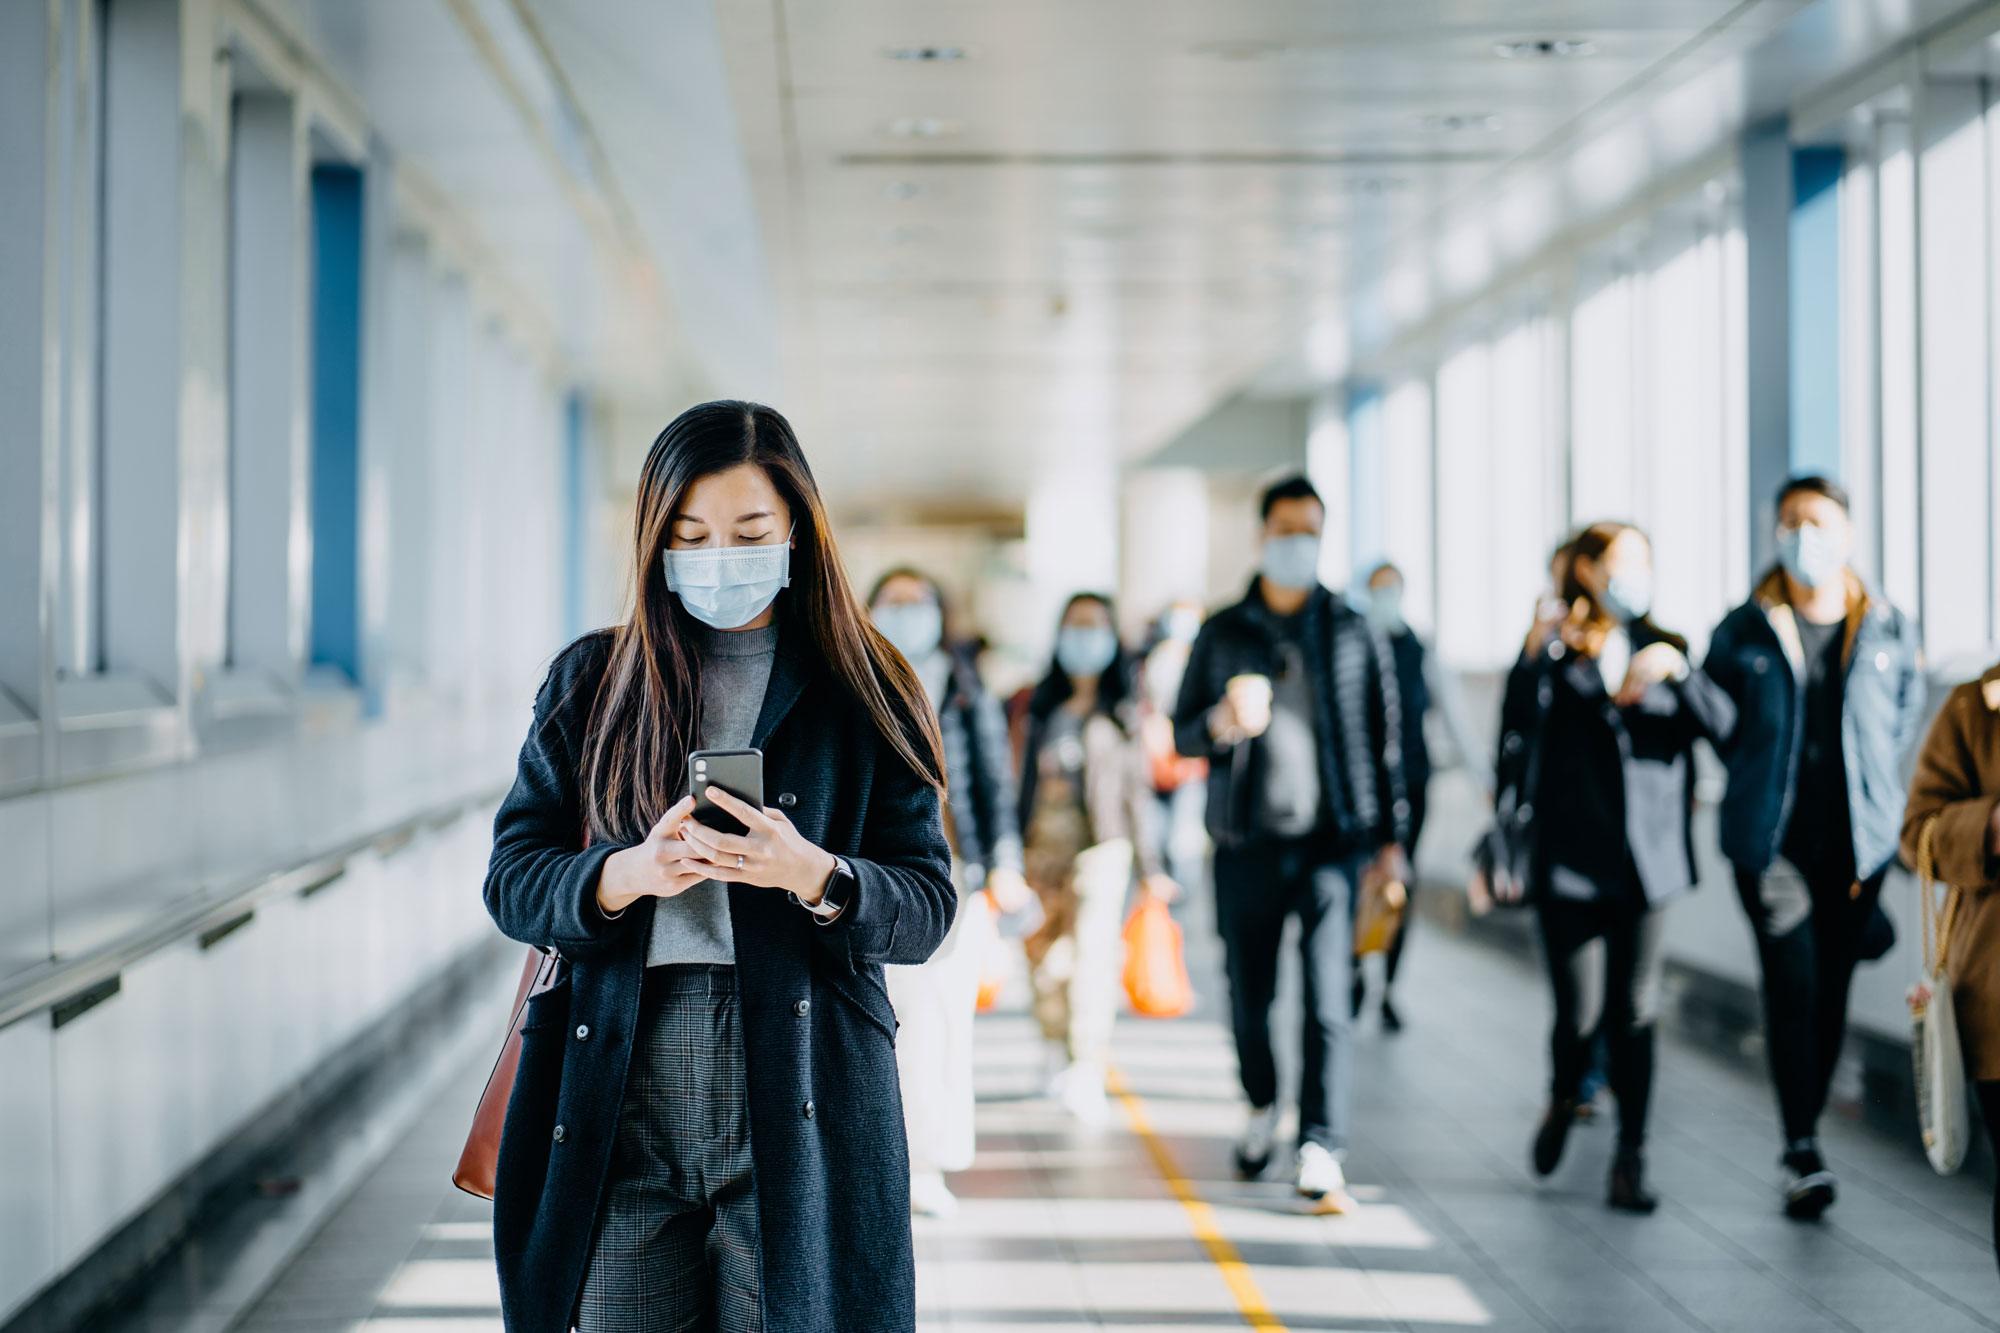 No downtime during pandemic shutdown